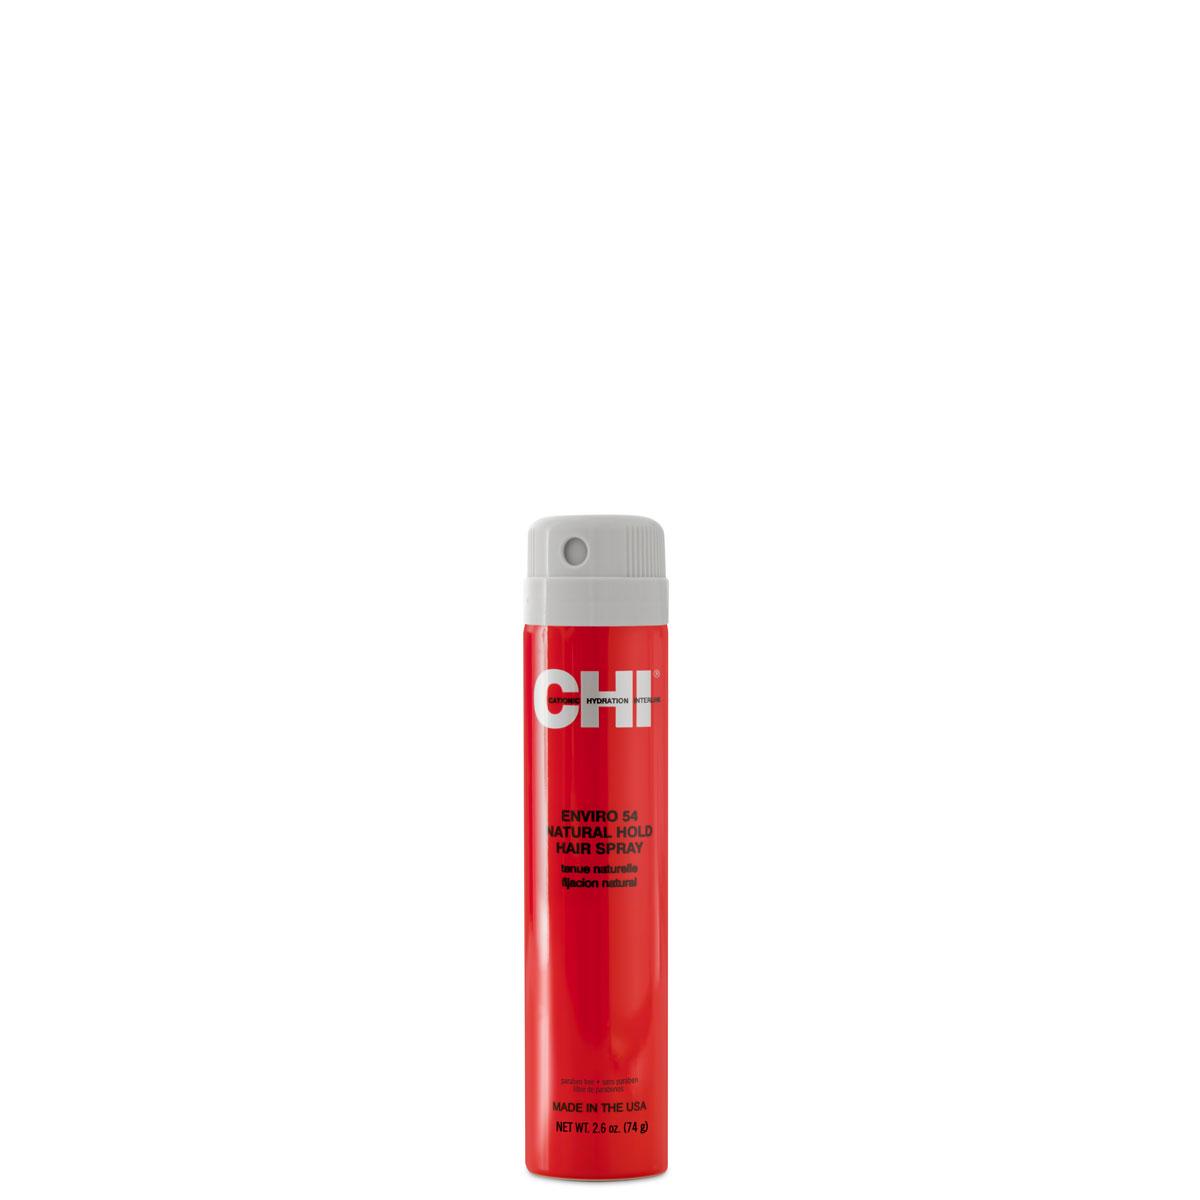 CHIStyling-Enviro54-HairSpray-NaturalHold2-6